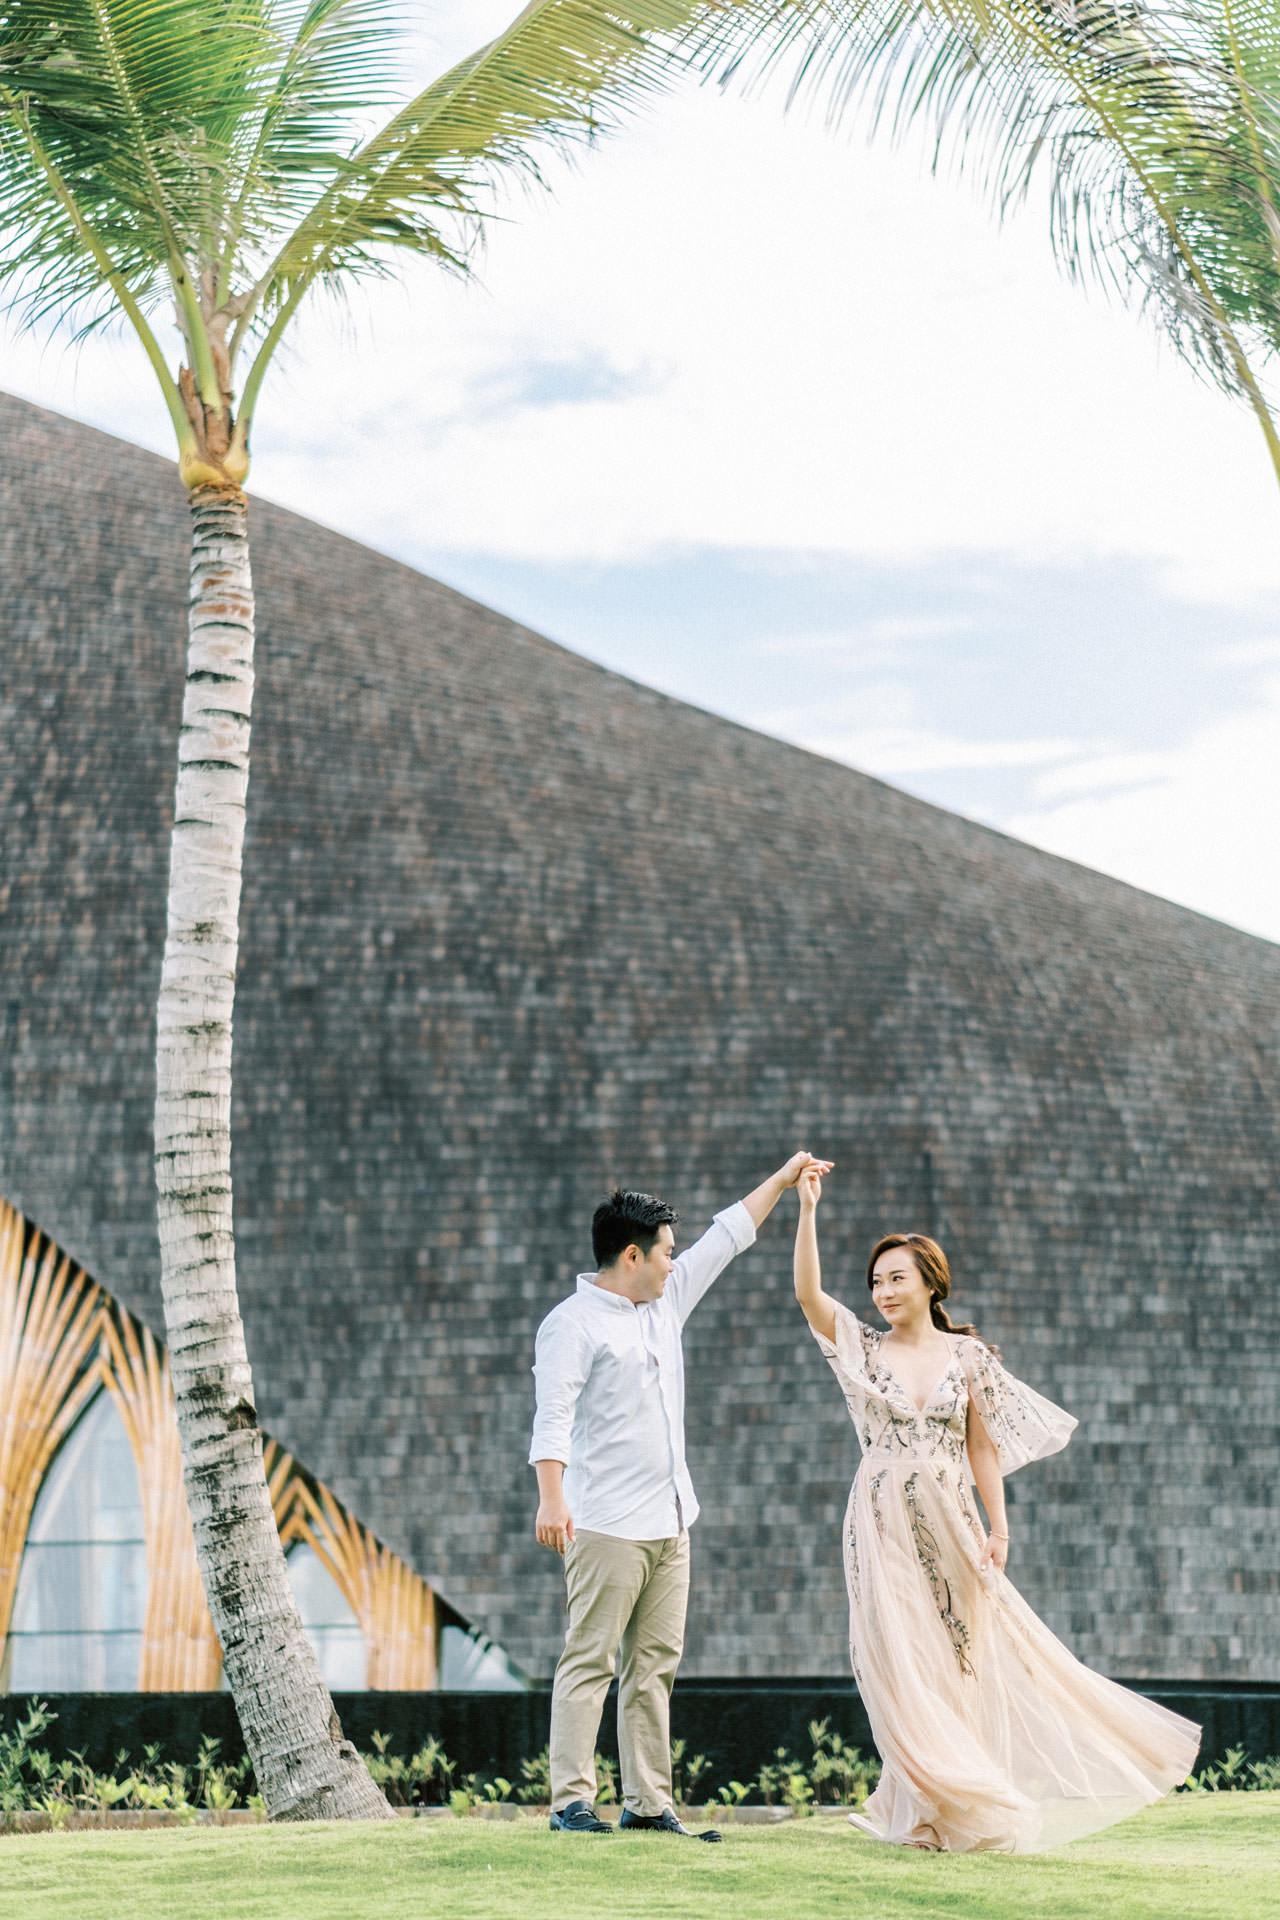 Apurva Kempinski Bali Proposal Photography 11